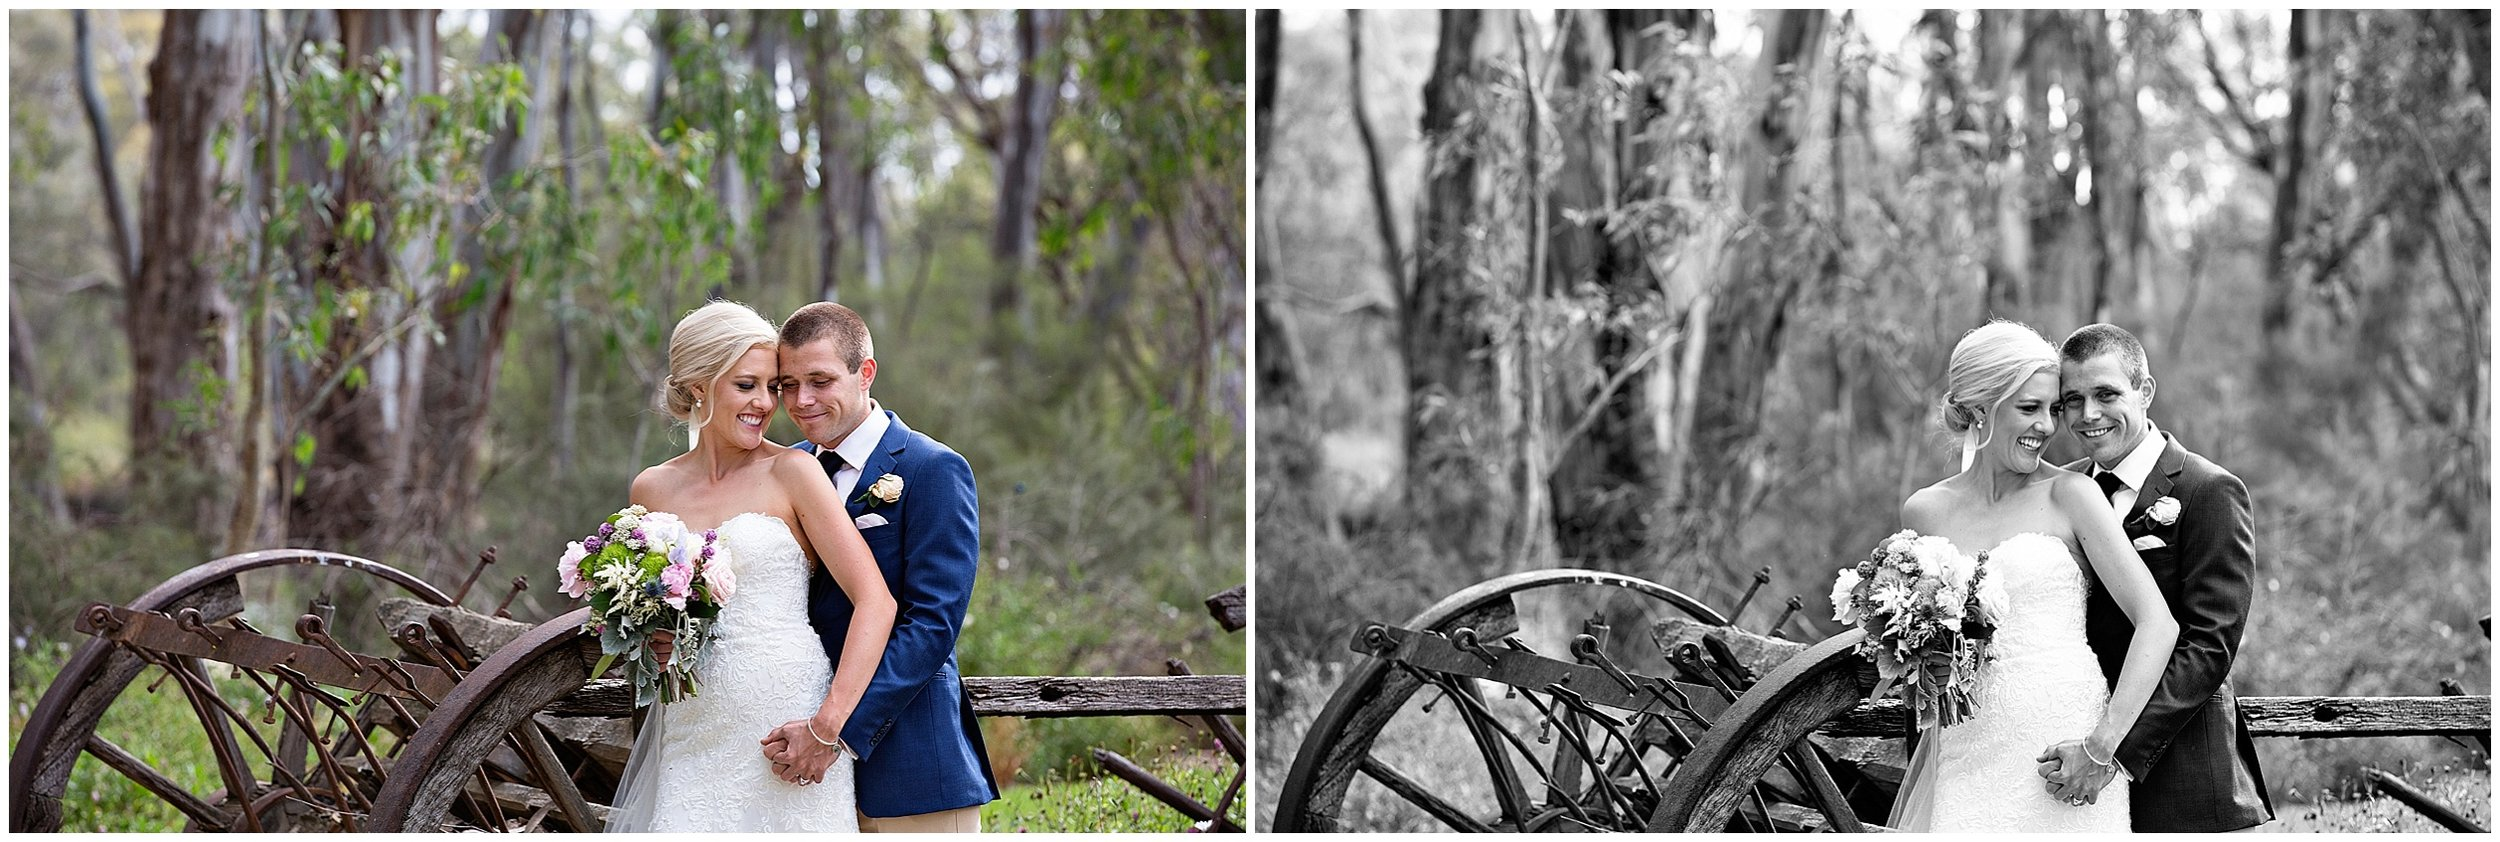 shepparton-wedding-photographer_0134.jpg